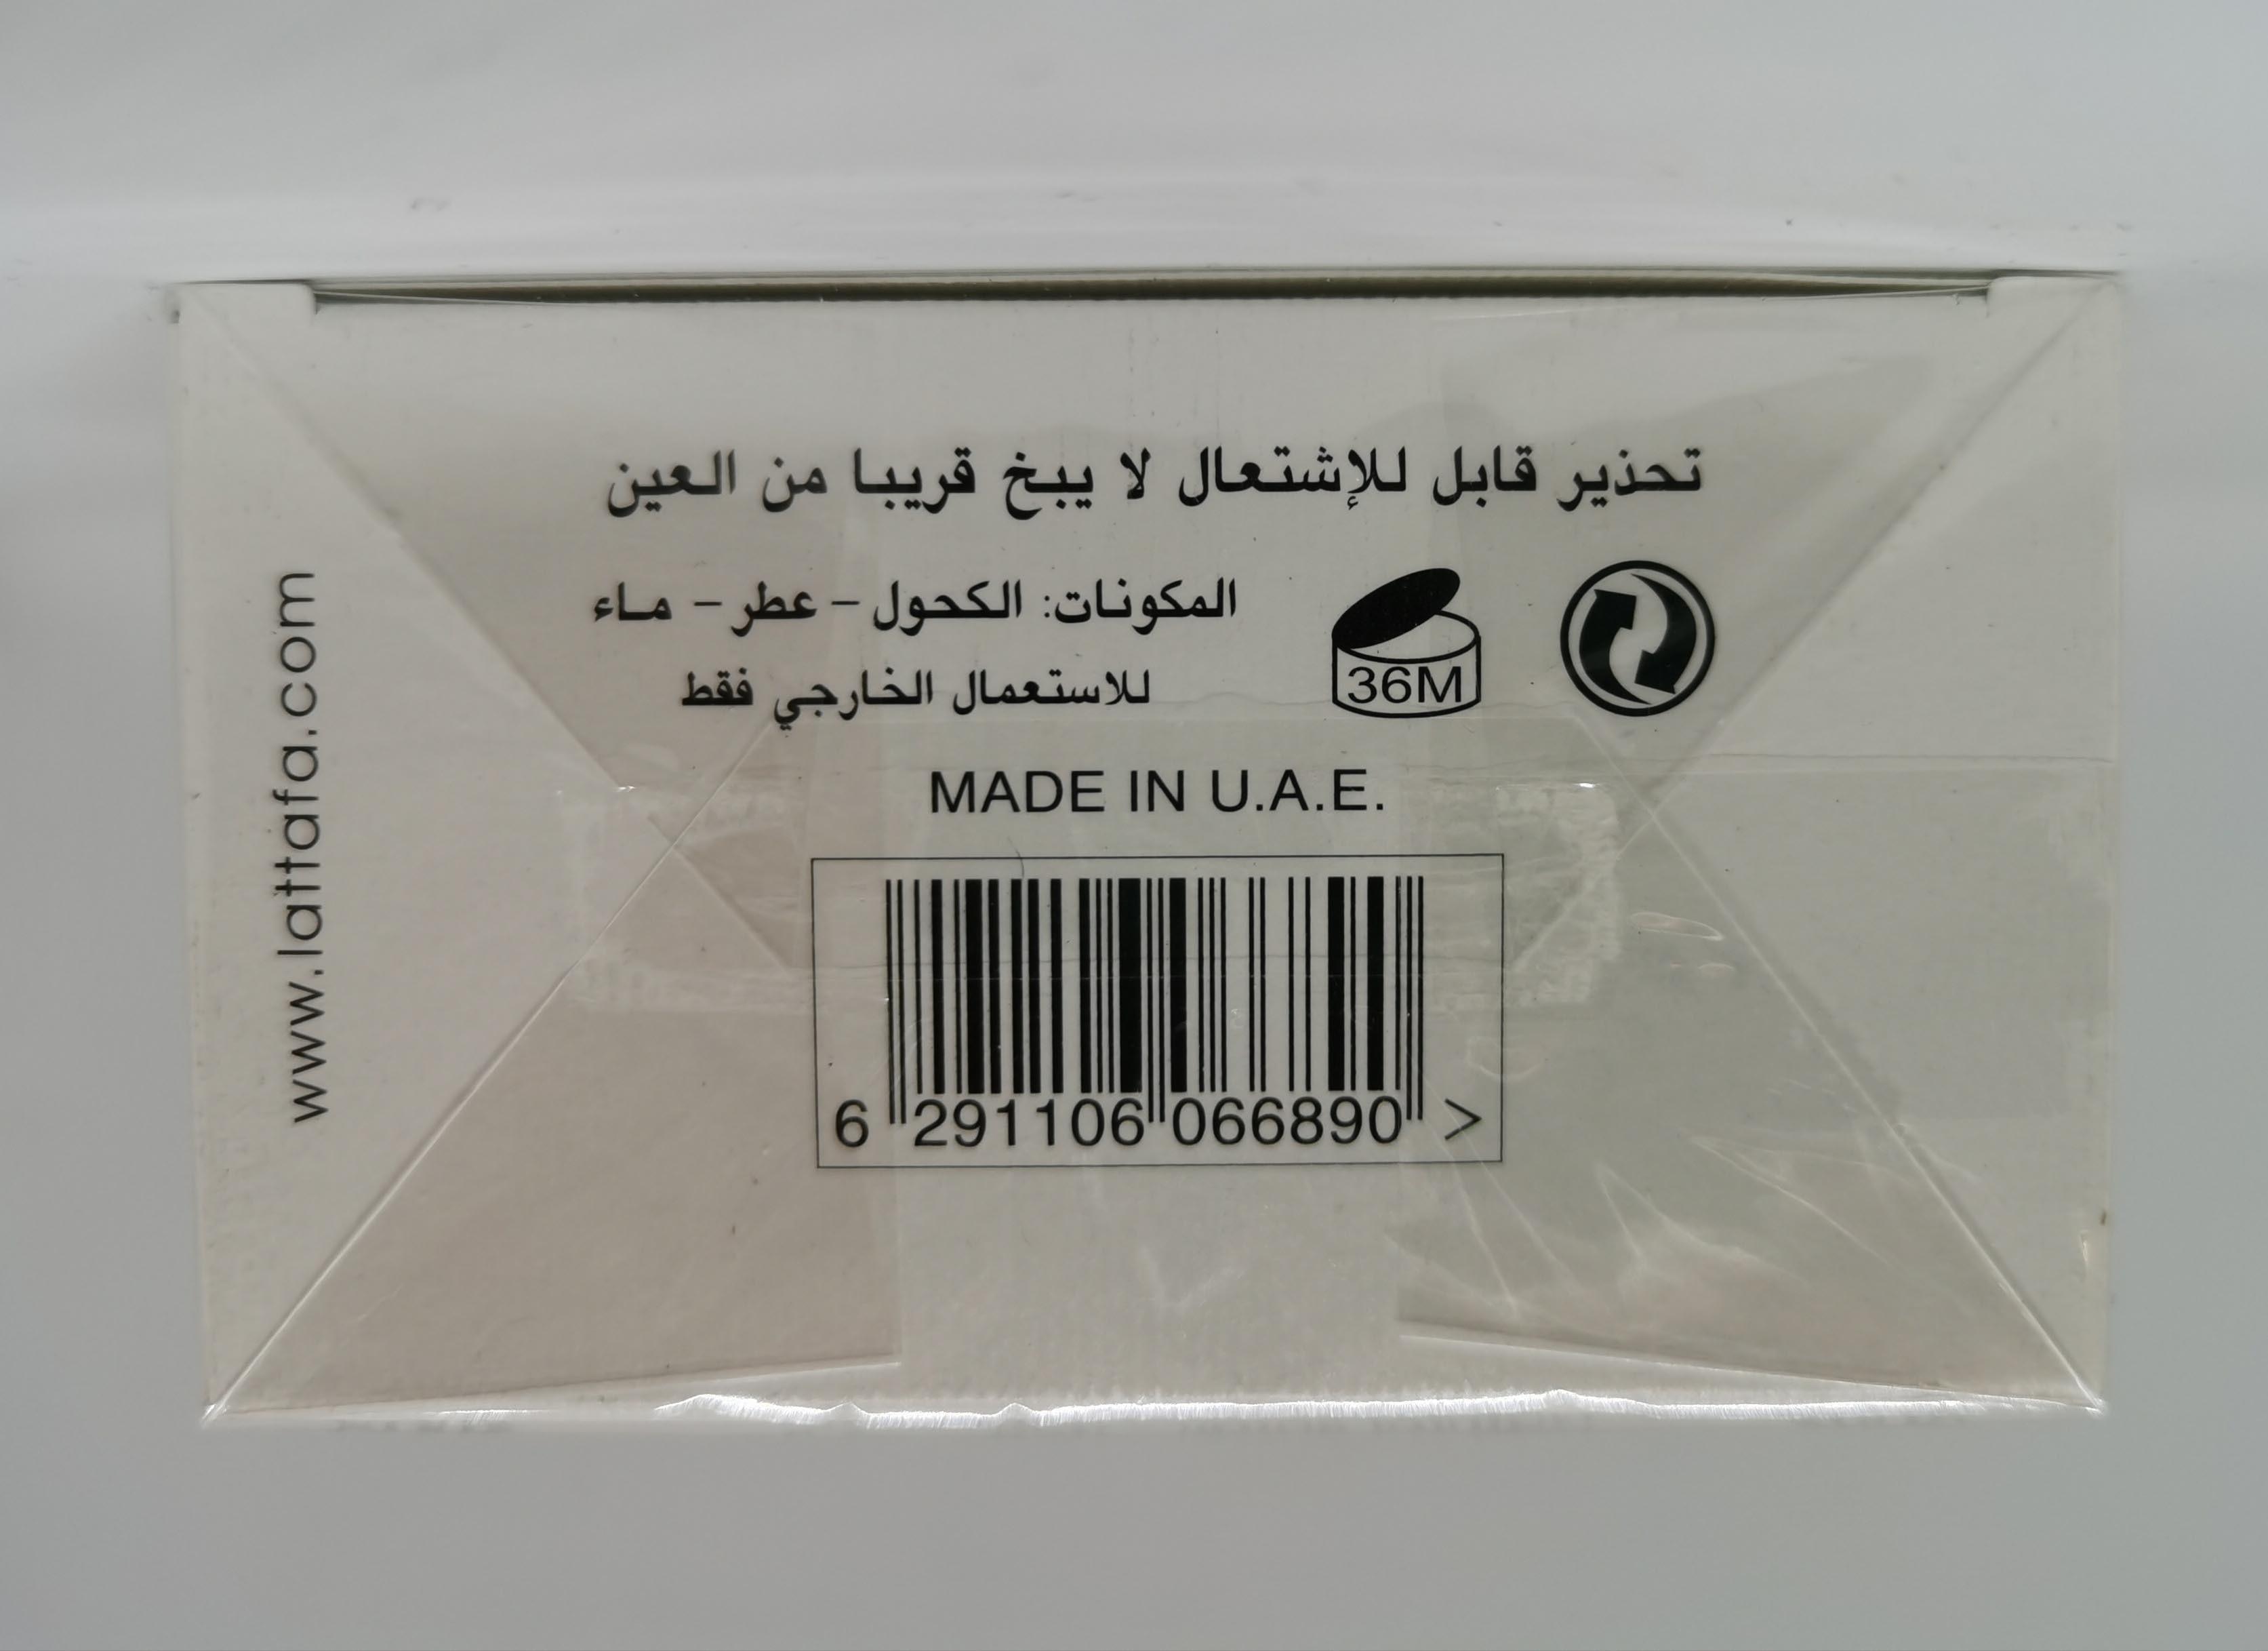 Парфюмерная вода 60 мл Lattafa Perfumes Ana Abiyedh - фото штрих-кода на коробке